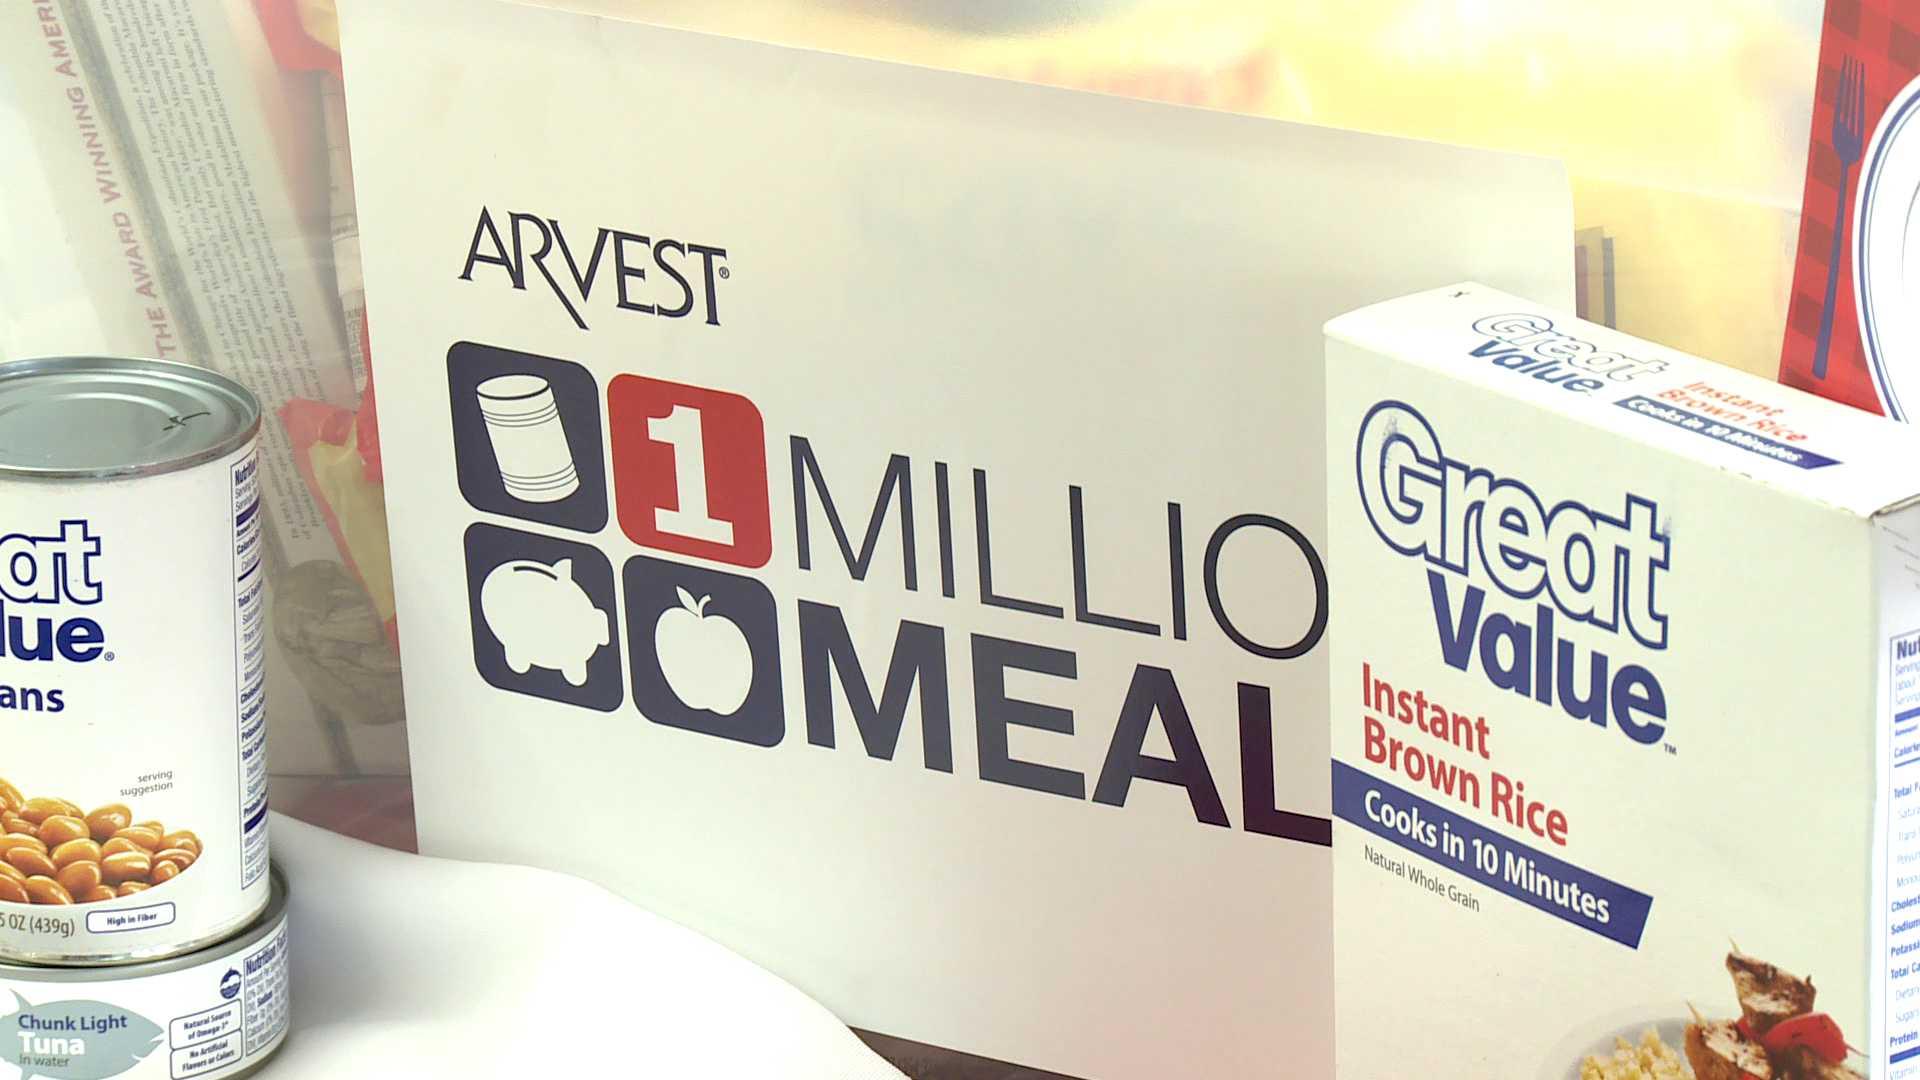 Arvest one million